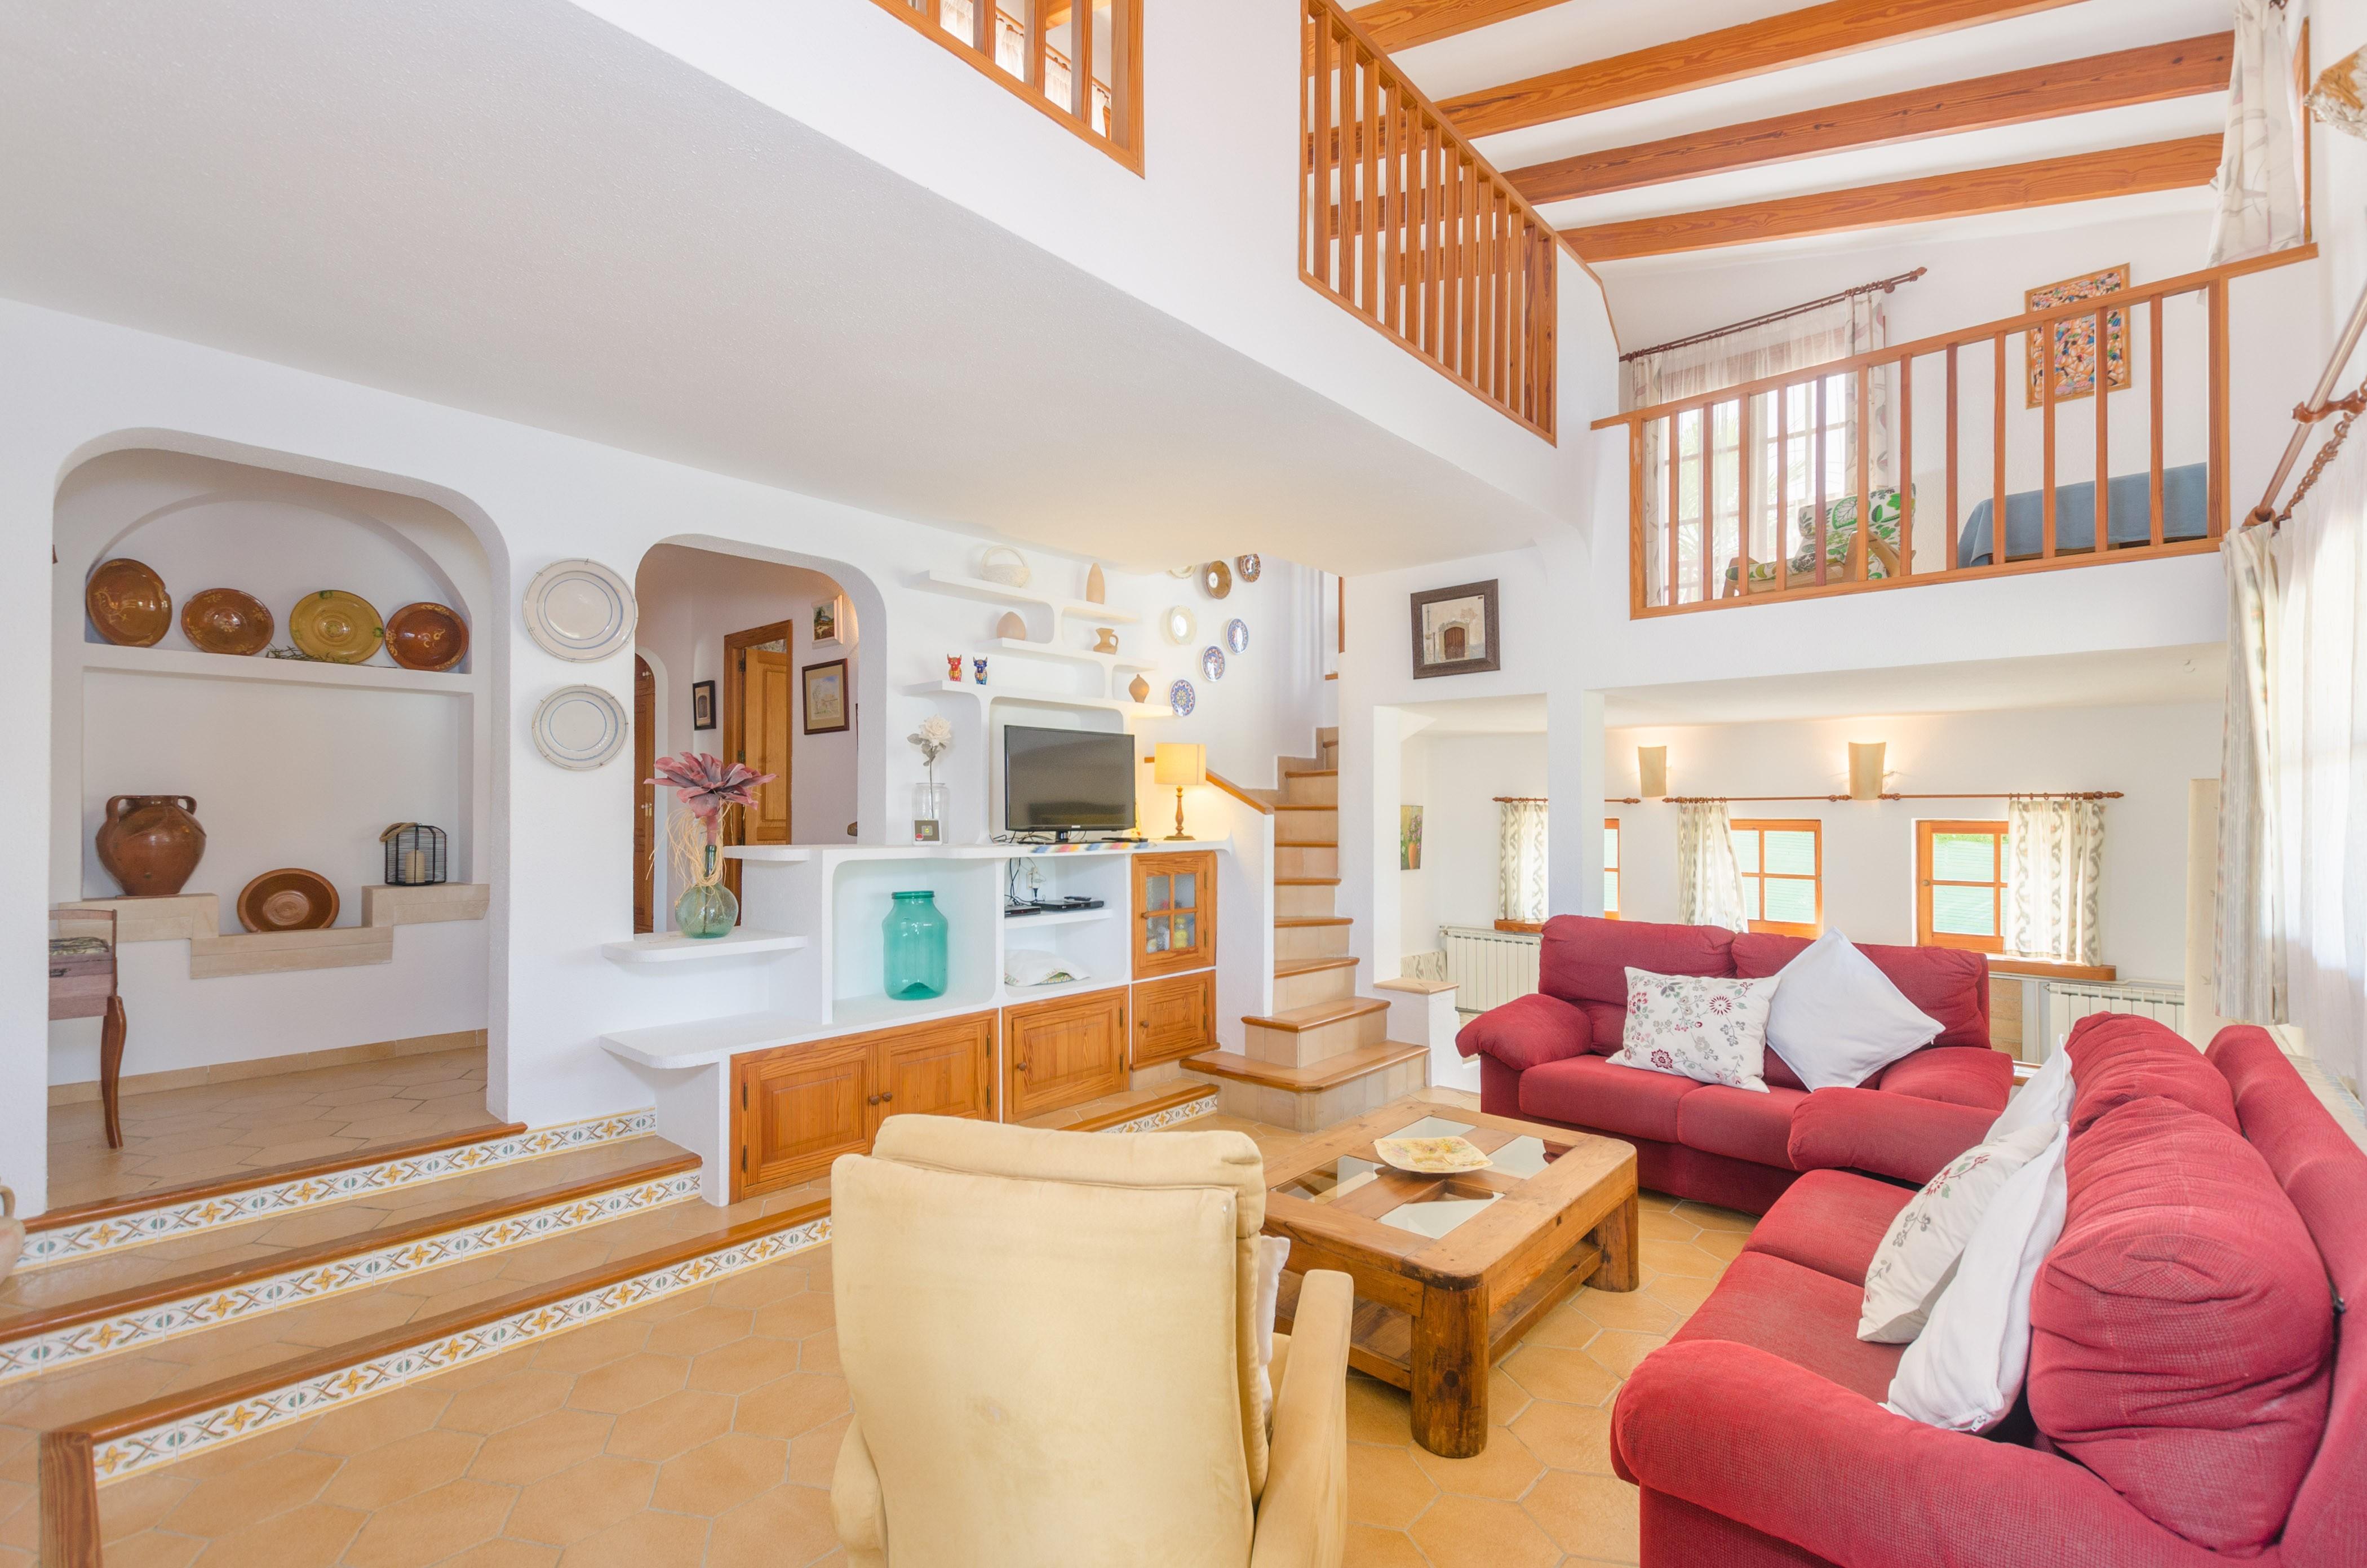 Maison de vacances SA SINIA (2374876), Lloret de Vistalegre, Majorque, Iles Baléares, Espagne, image 16